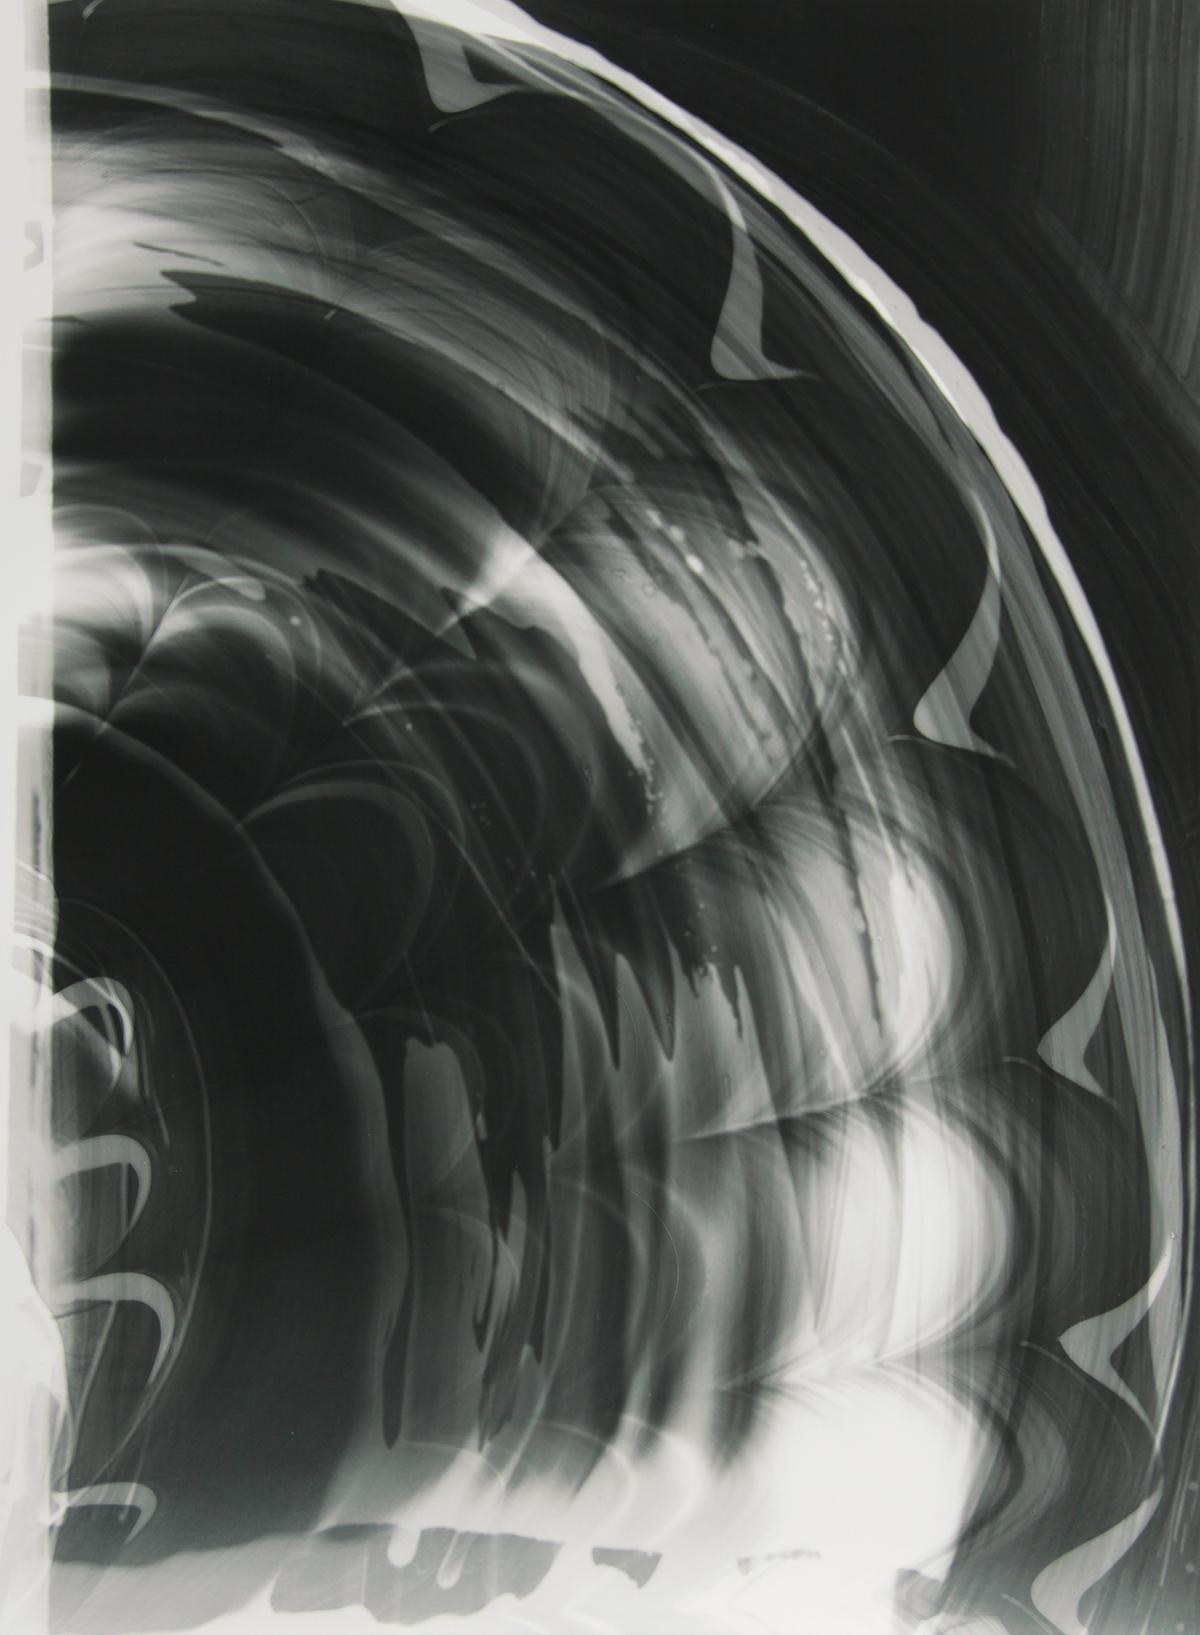 Blind Light 25, unique photogram 2015